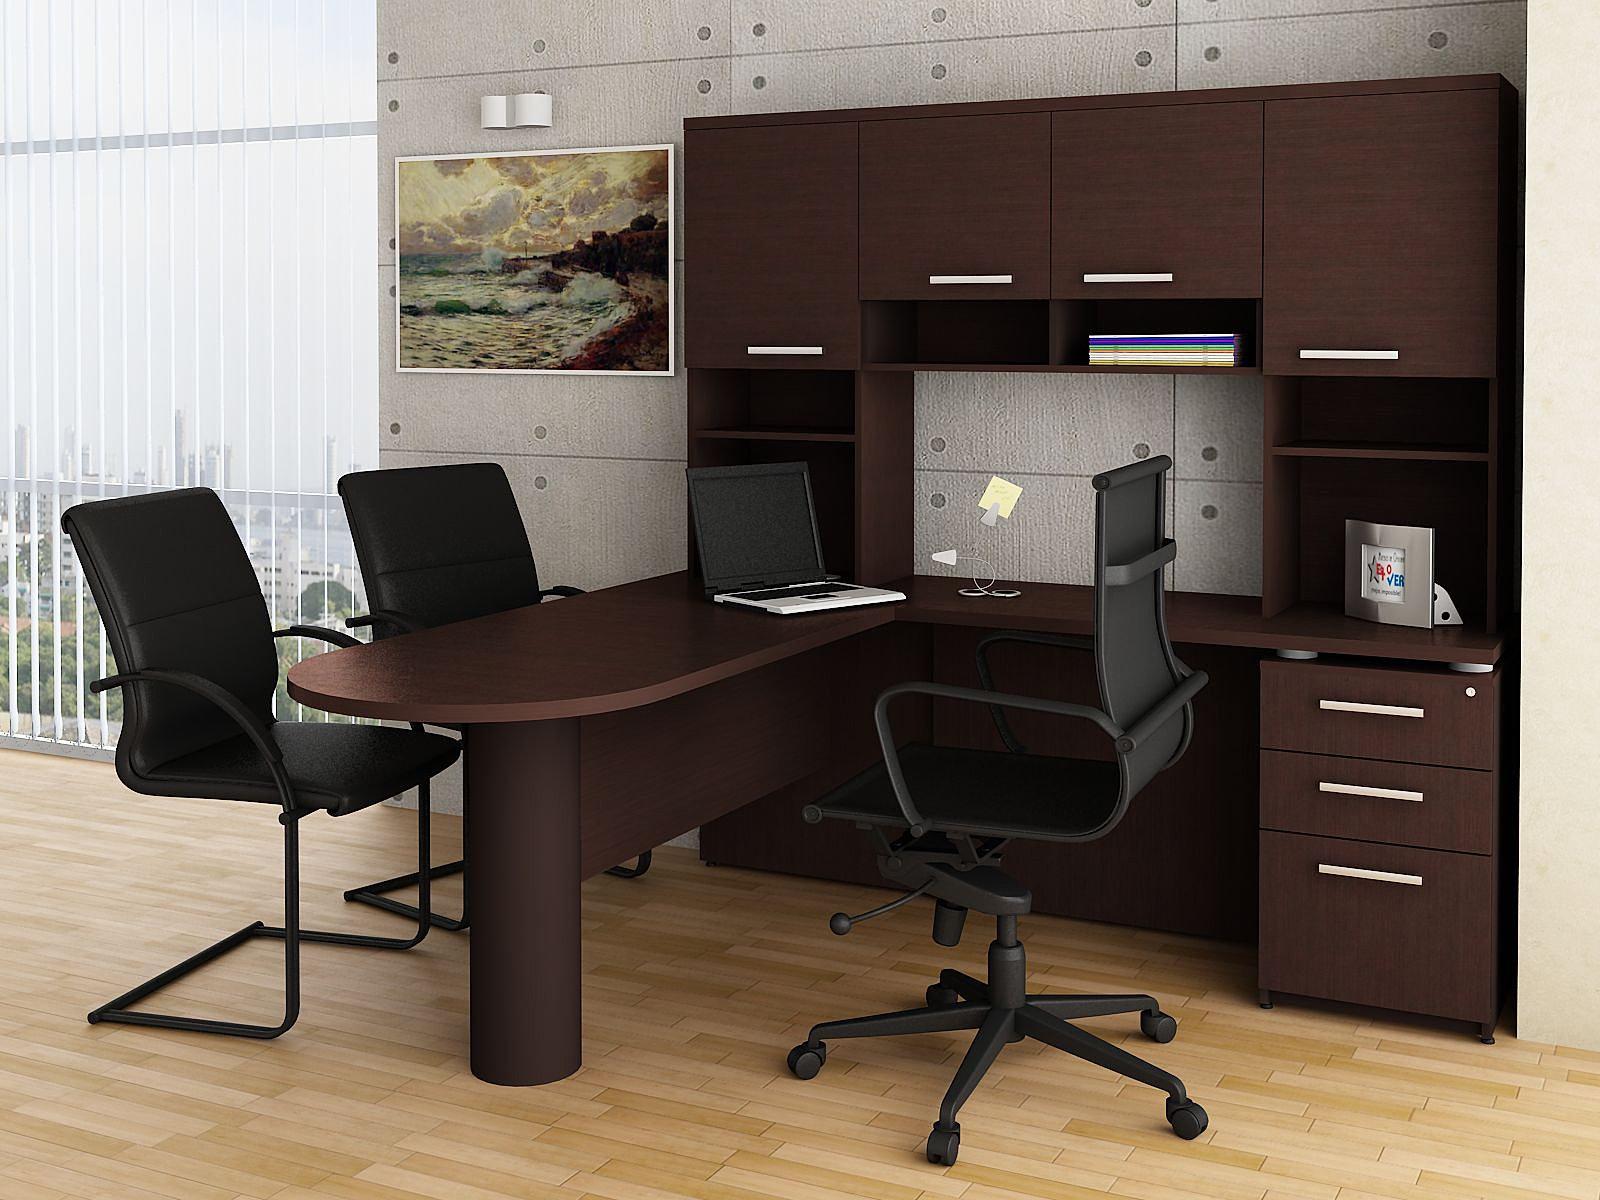 Image Result For Muebles Oficina